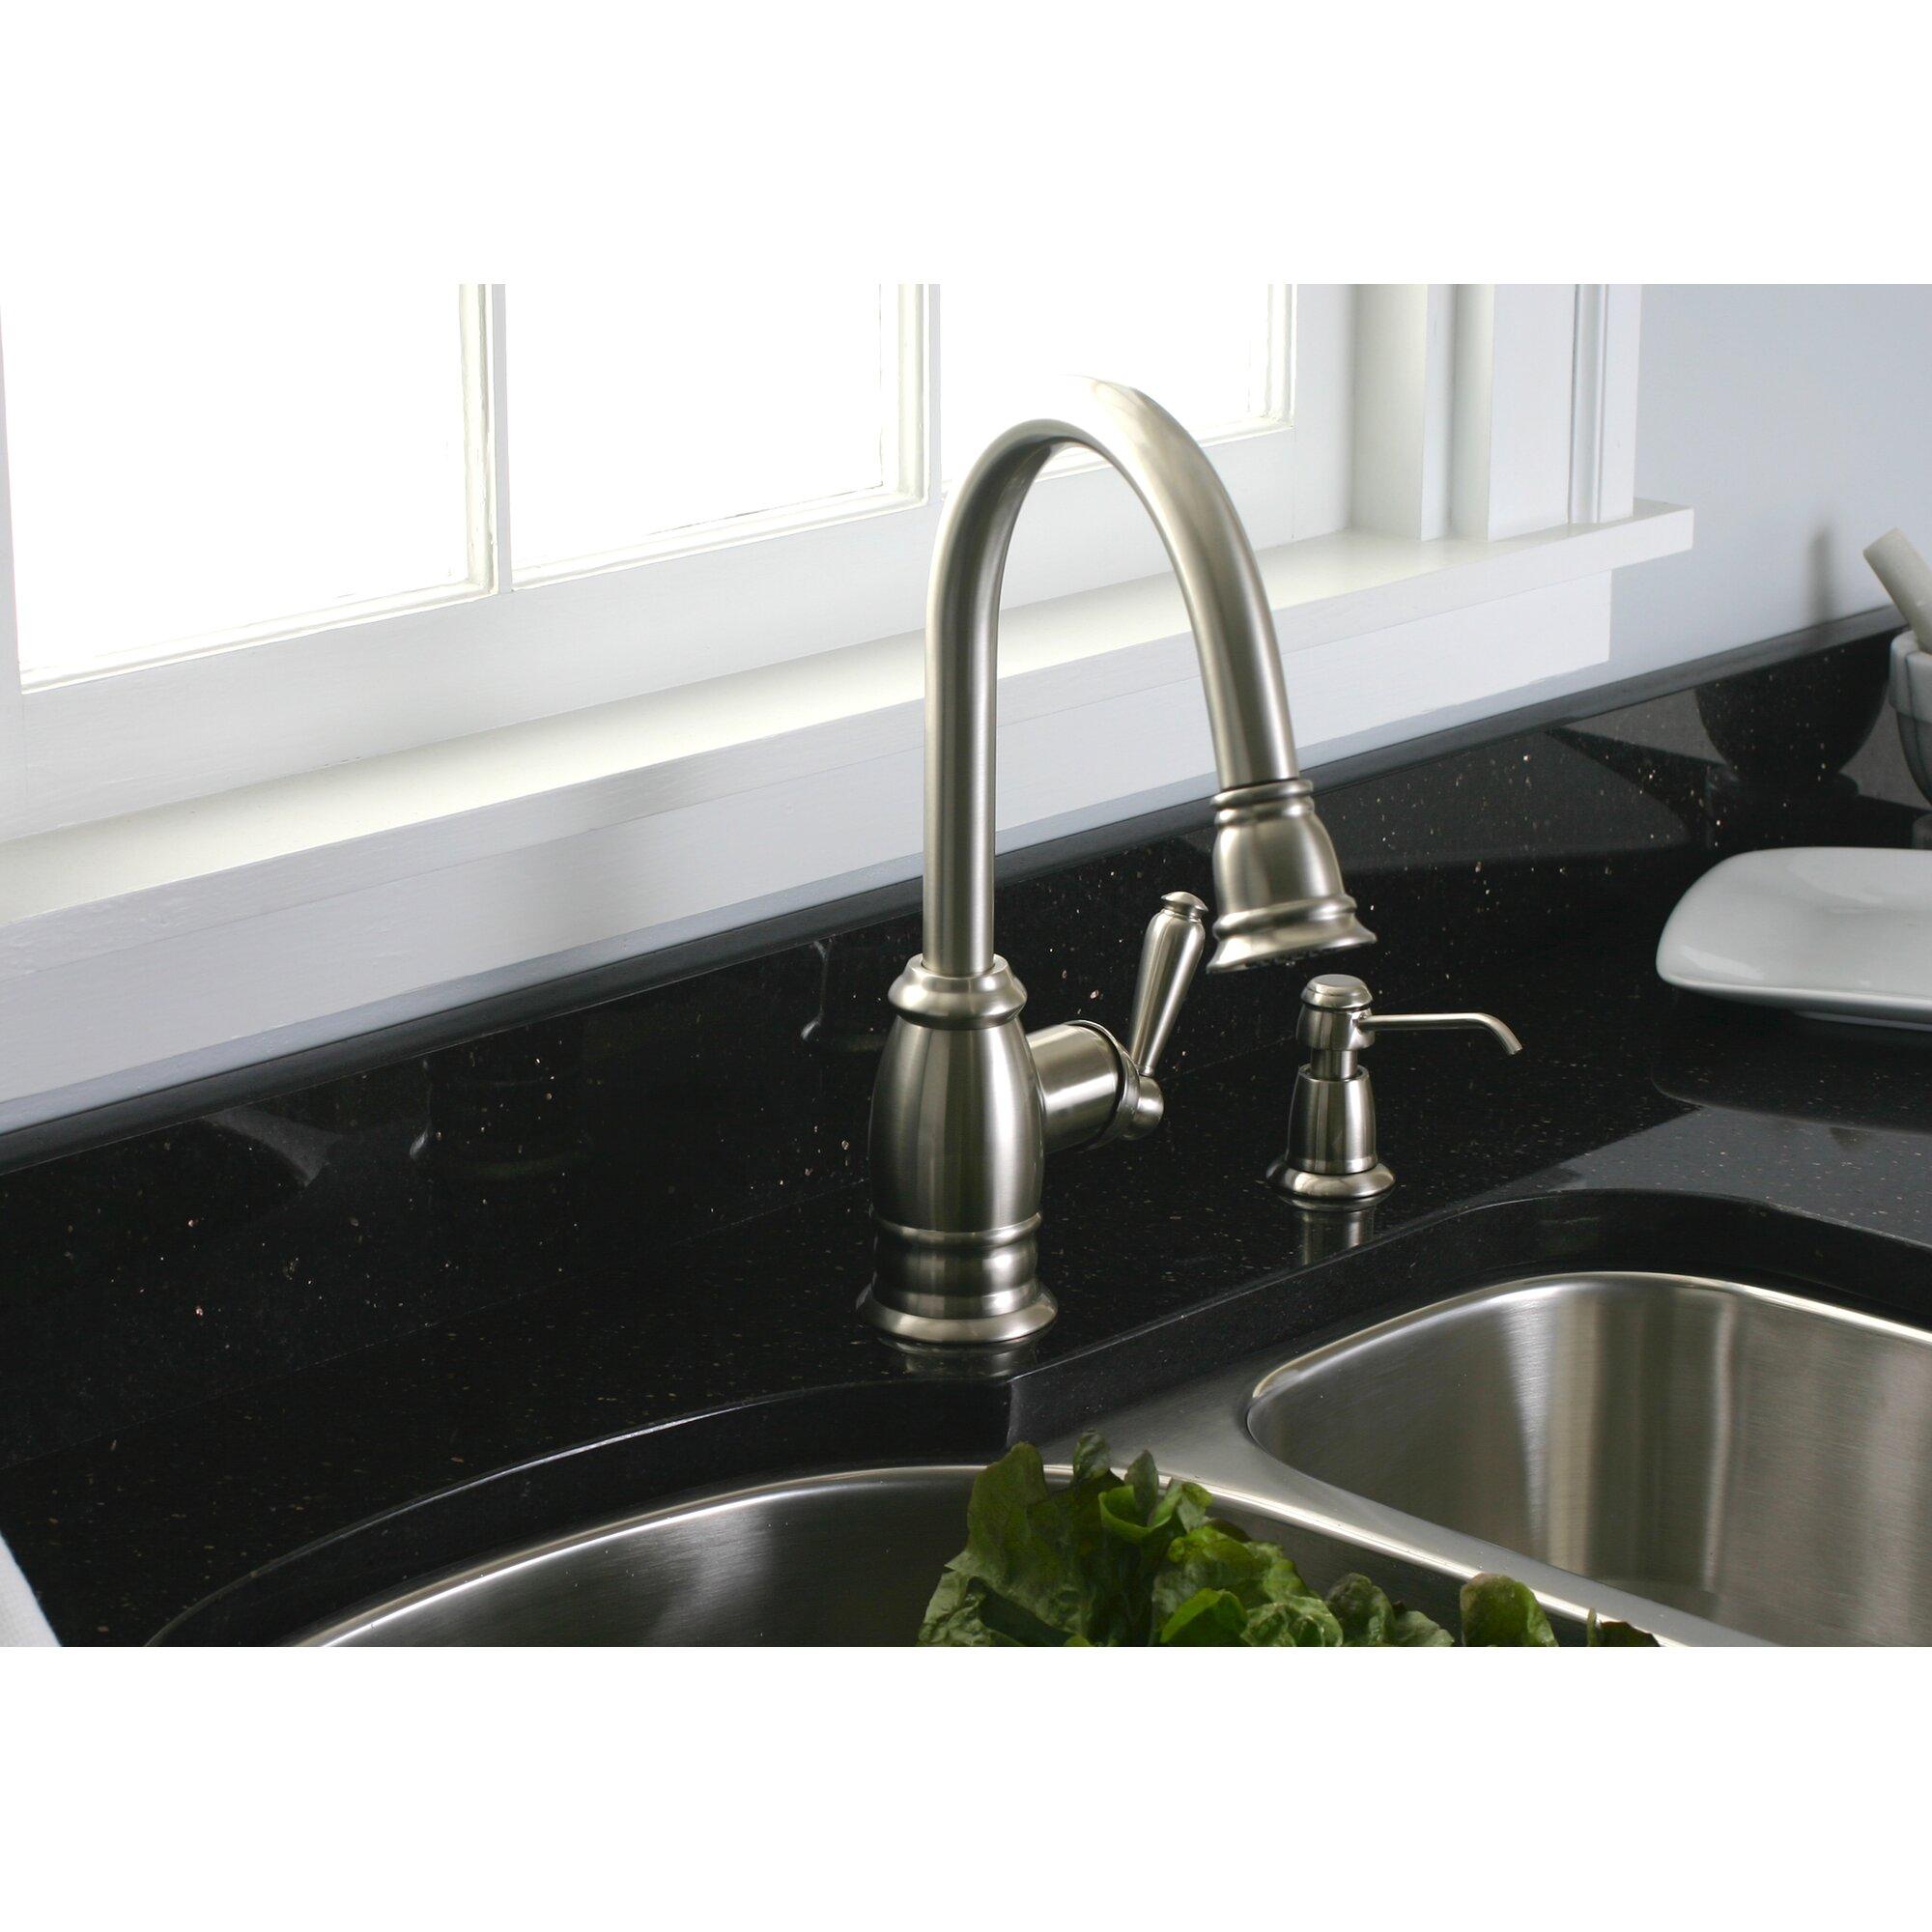 Premier Faucet Sonoma One Handle Centerset Pull-Down